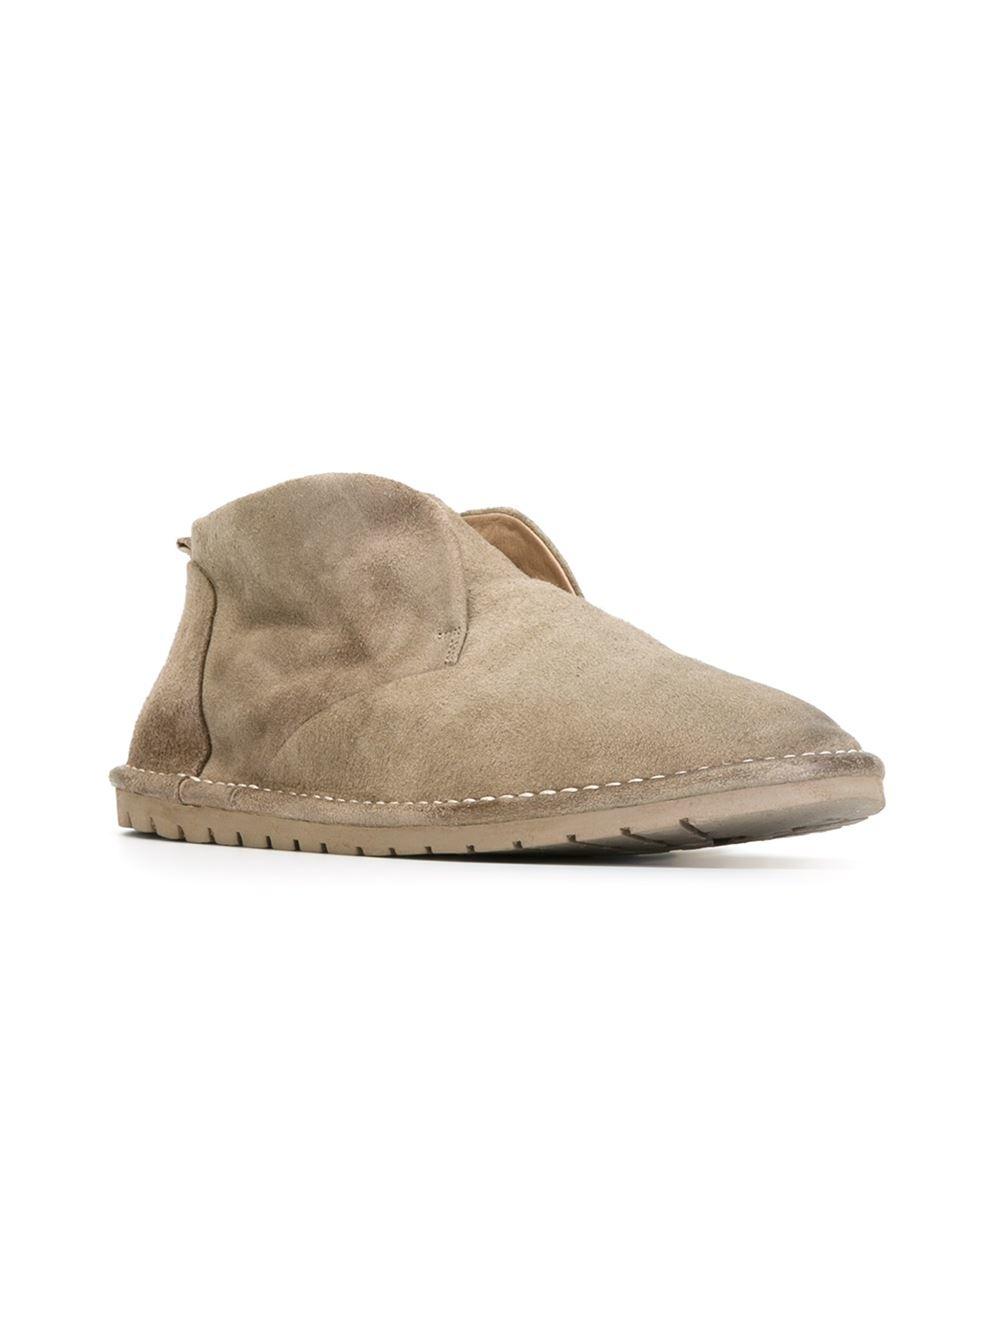 MARS LL Desert boots Beige Leather 1A4ltcl1